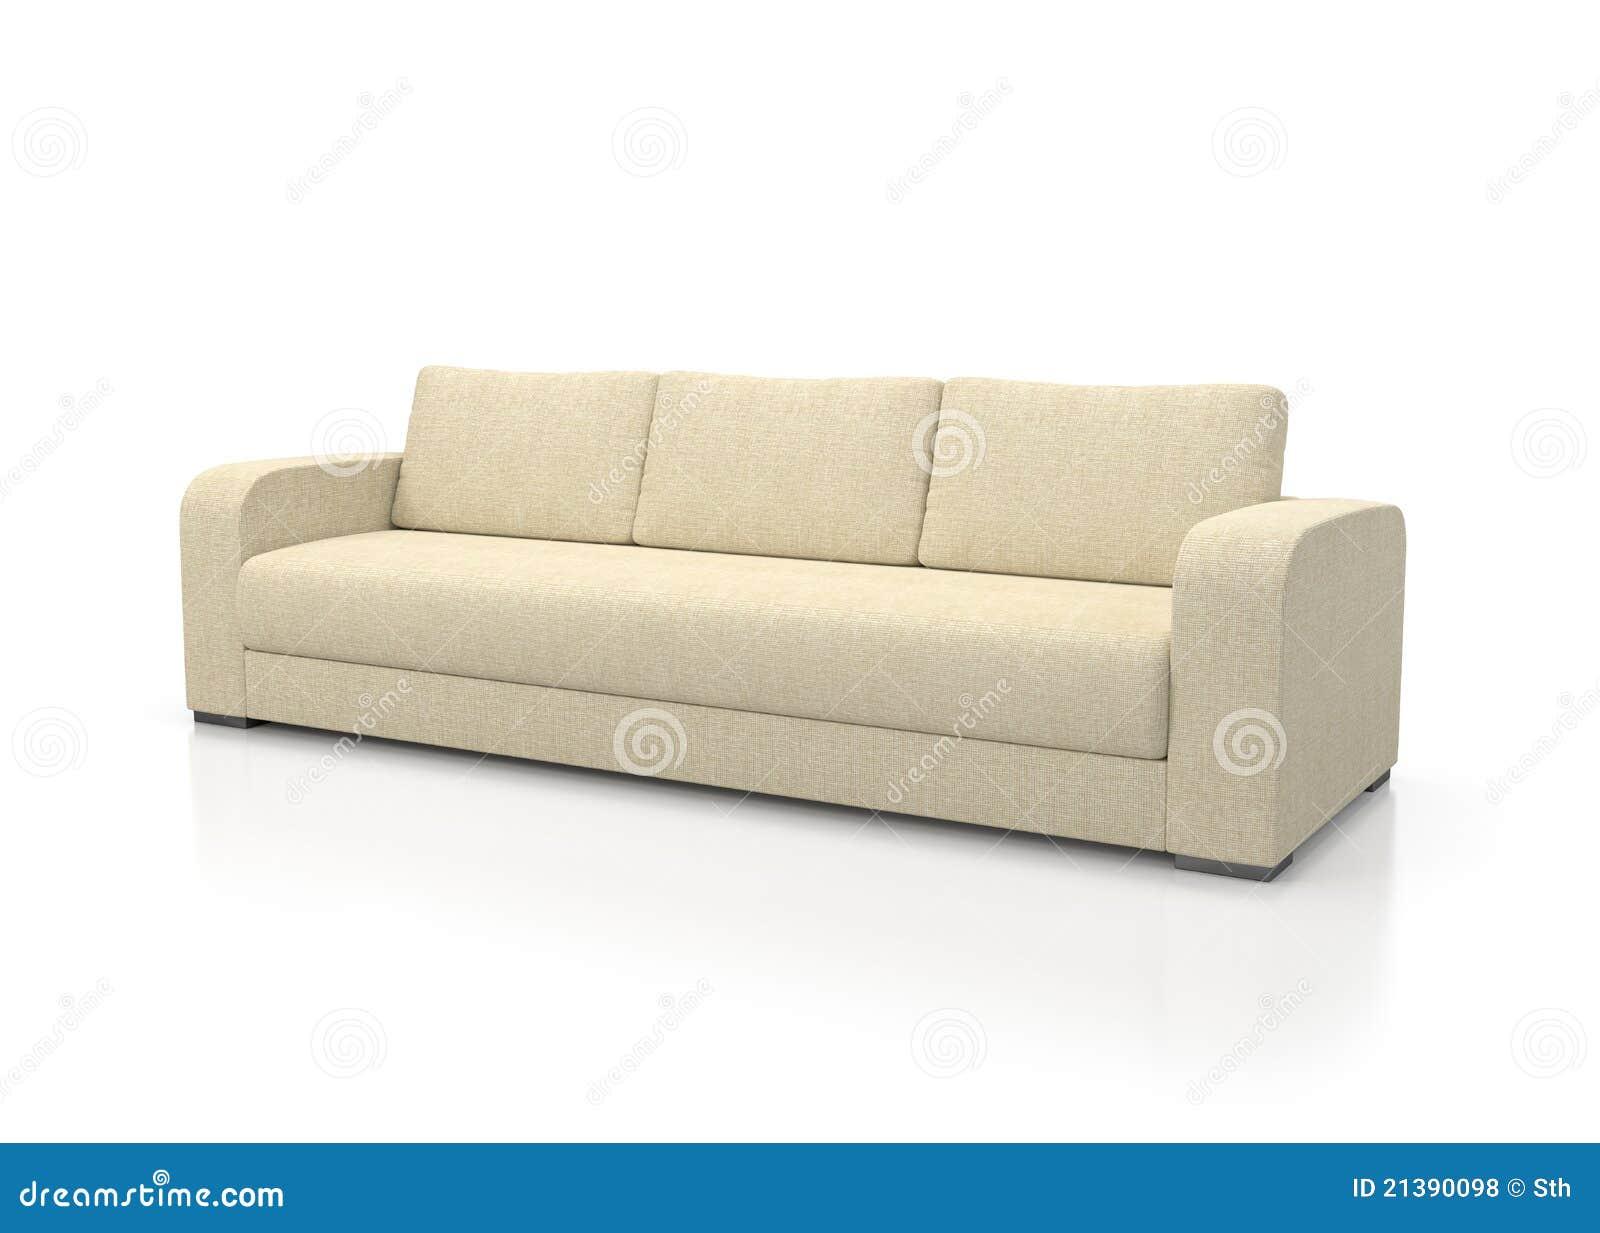 sofa moderne photos libres de droits image 21390098. Black Bedroom Furniture Sets. Home Design Ideas